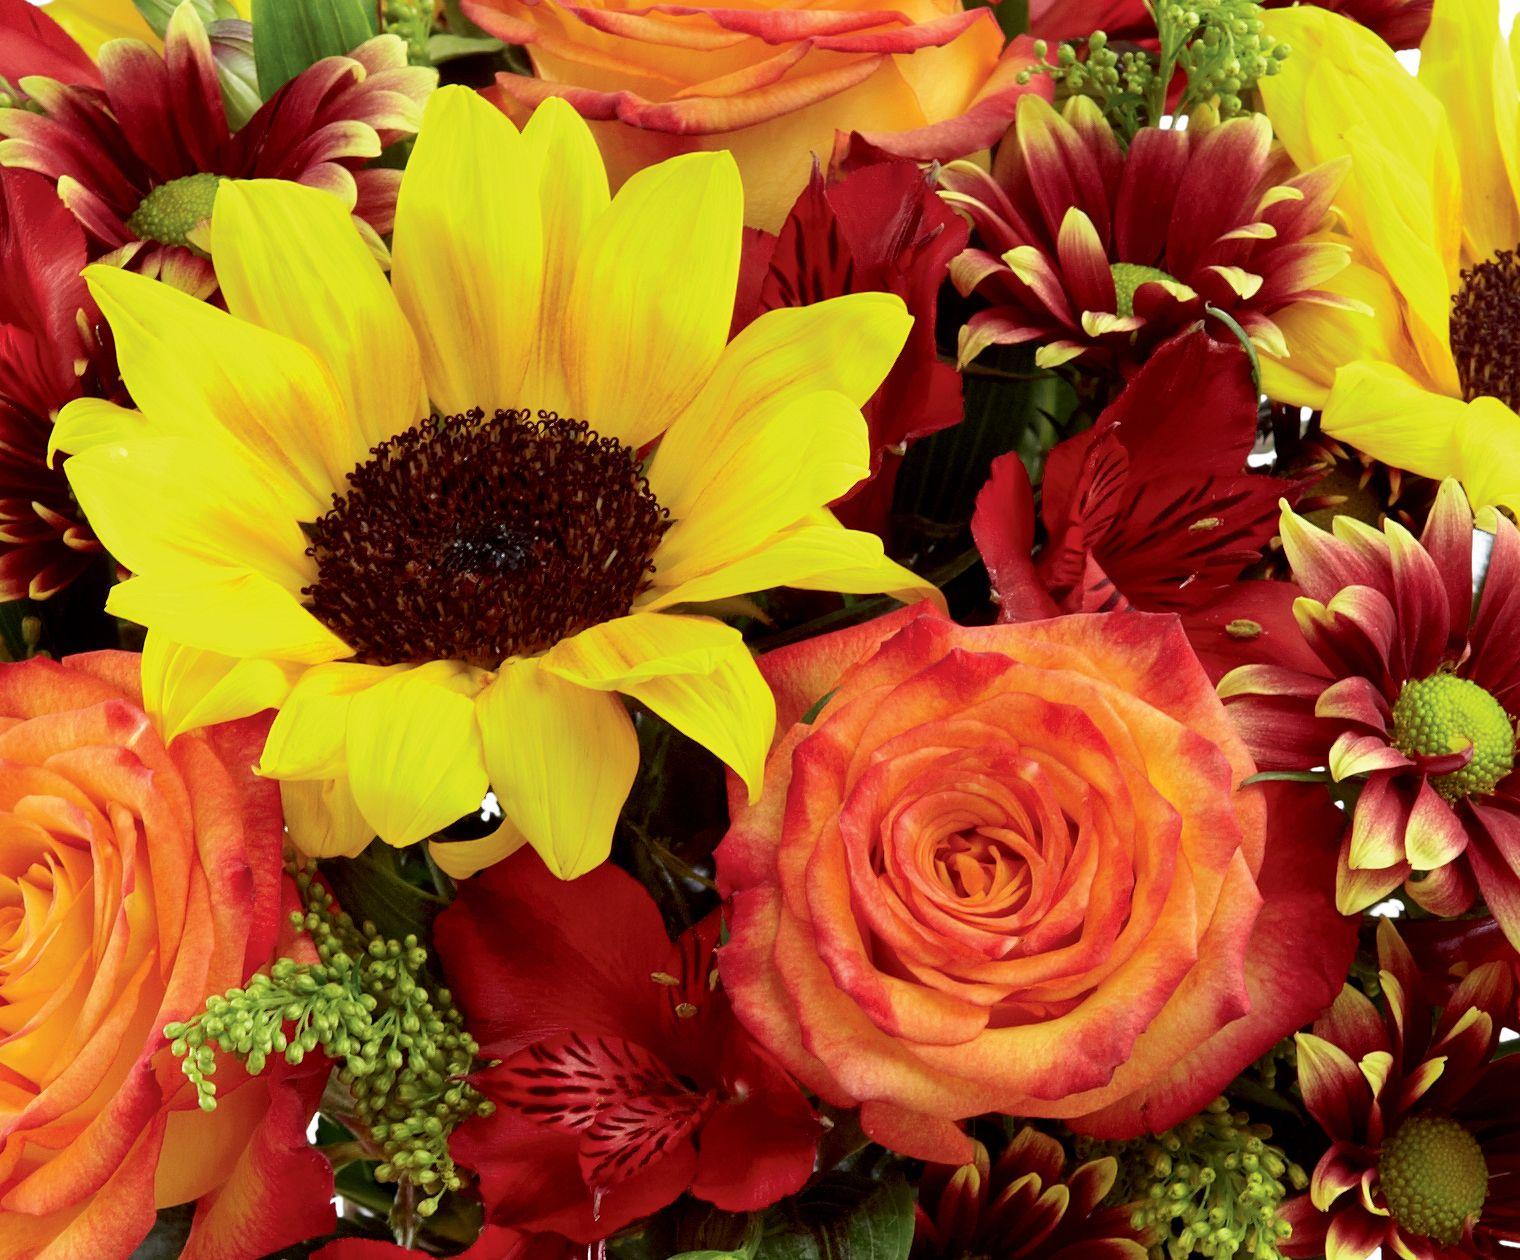 Country Sunflower Mason Jar at Send Flowers Orange rose